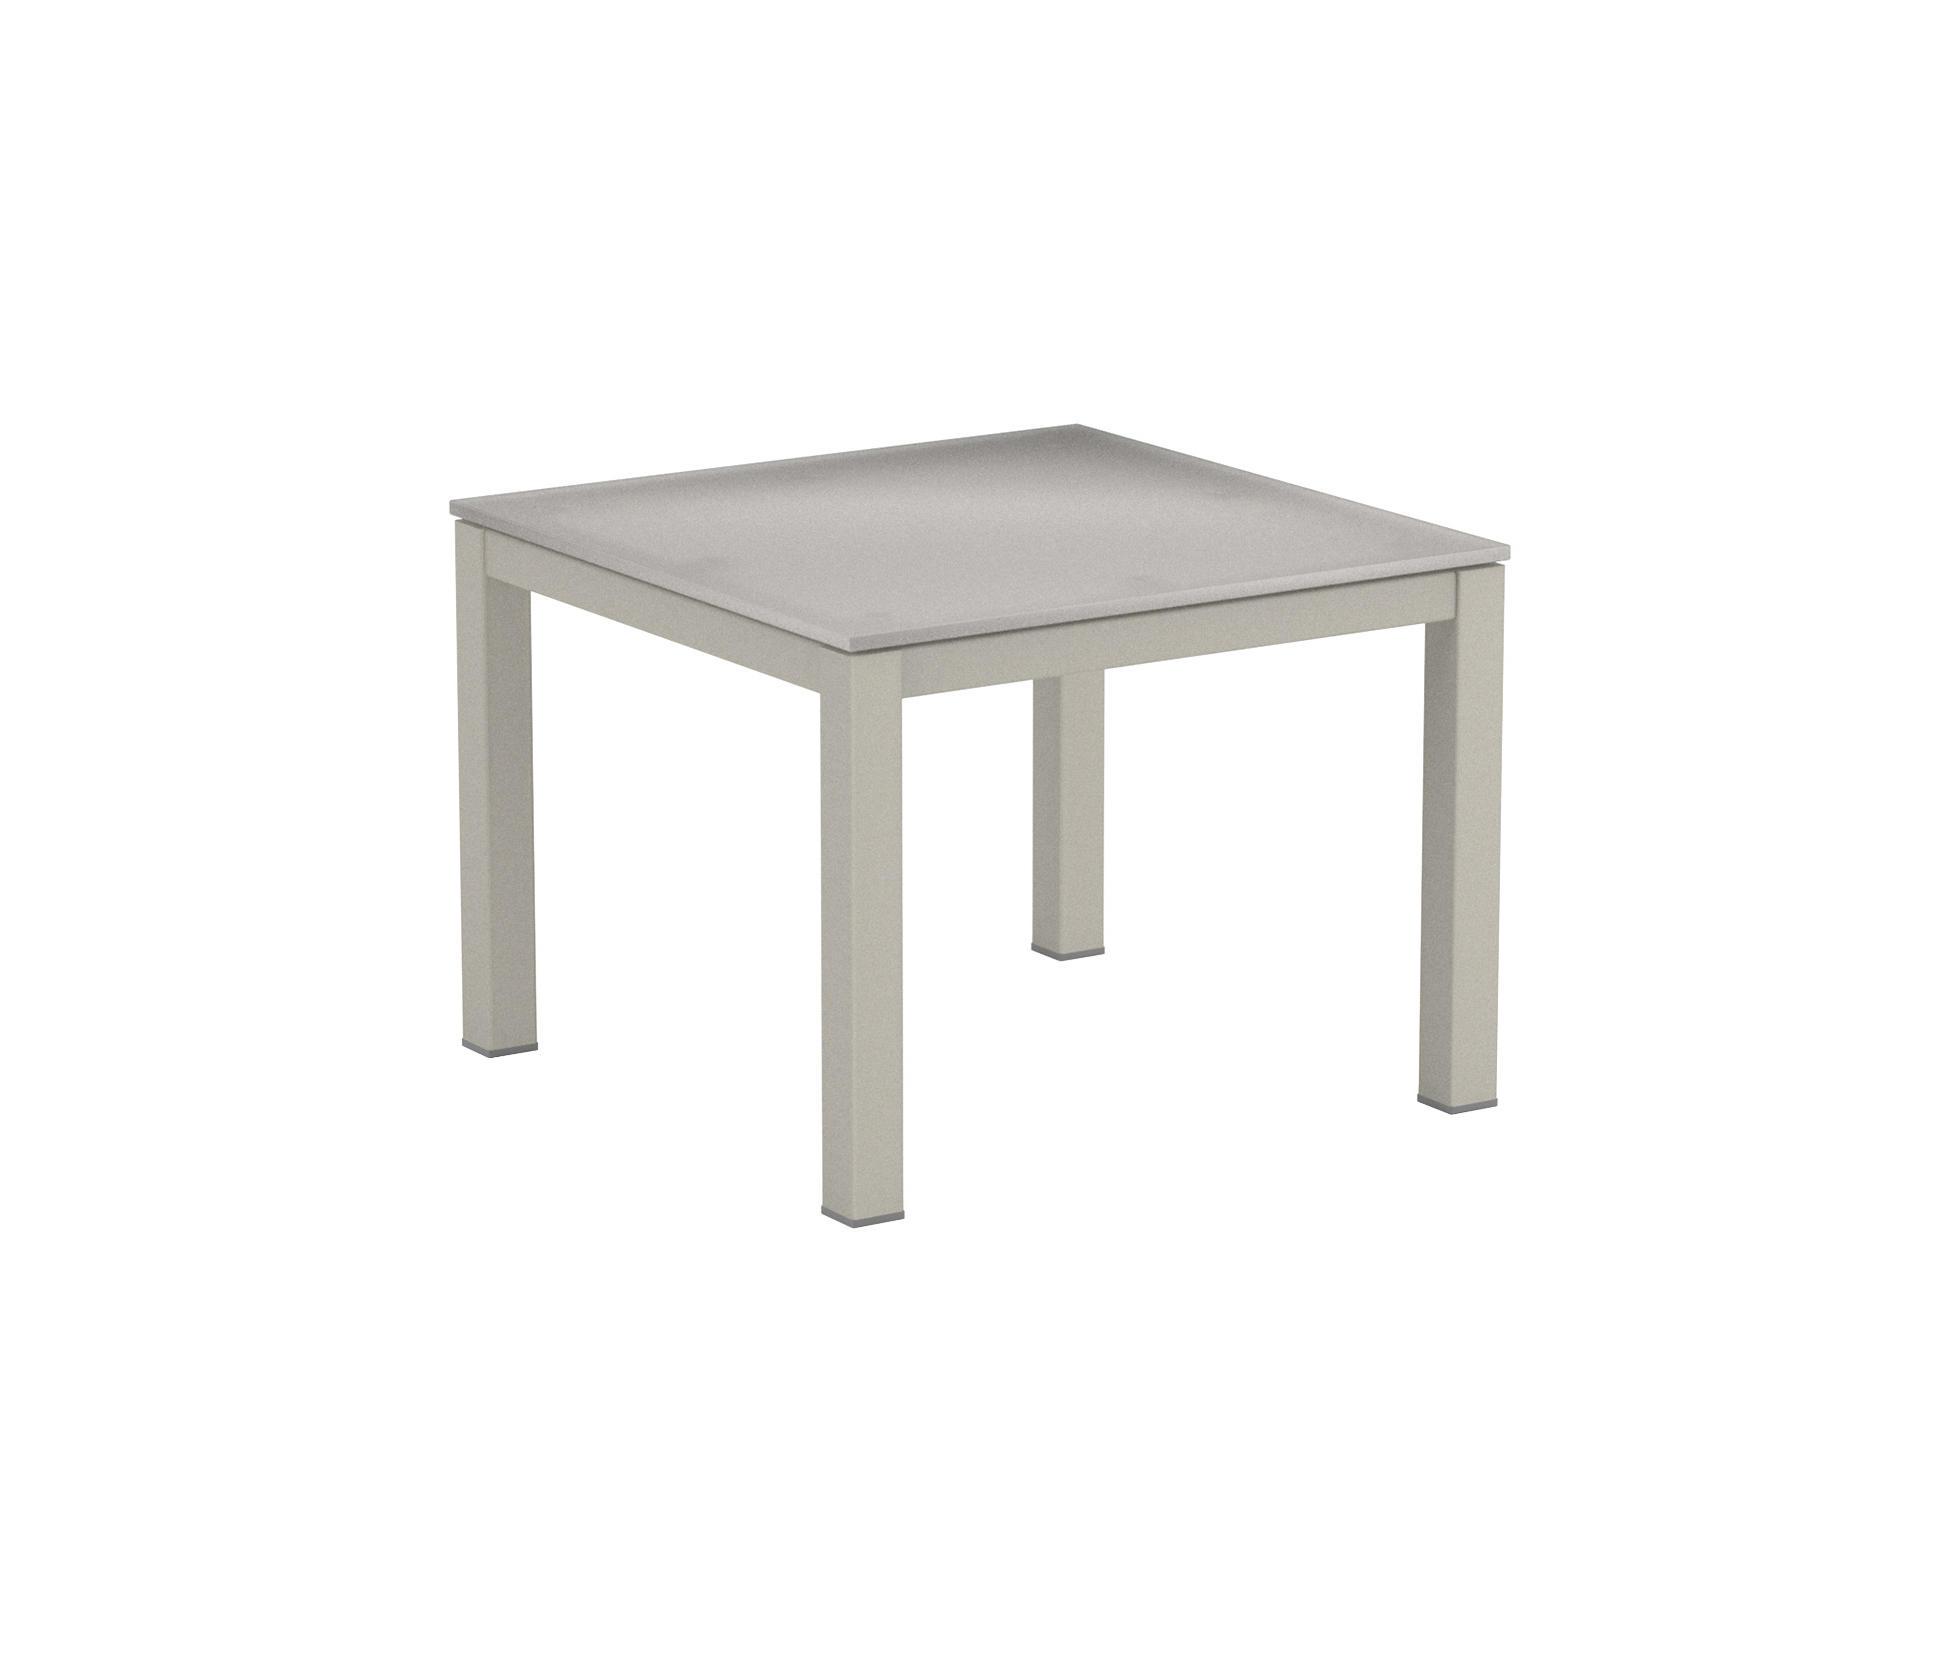 Tremendous Taboela 50 Sidetable Designer Furniture Architonic Creativecarmelina Interior Chair Design Creativecarmelinacom